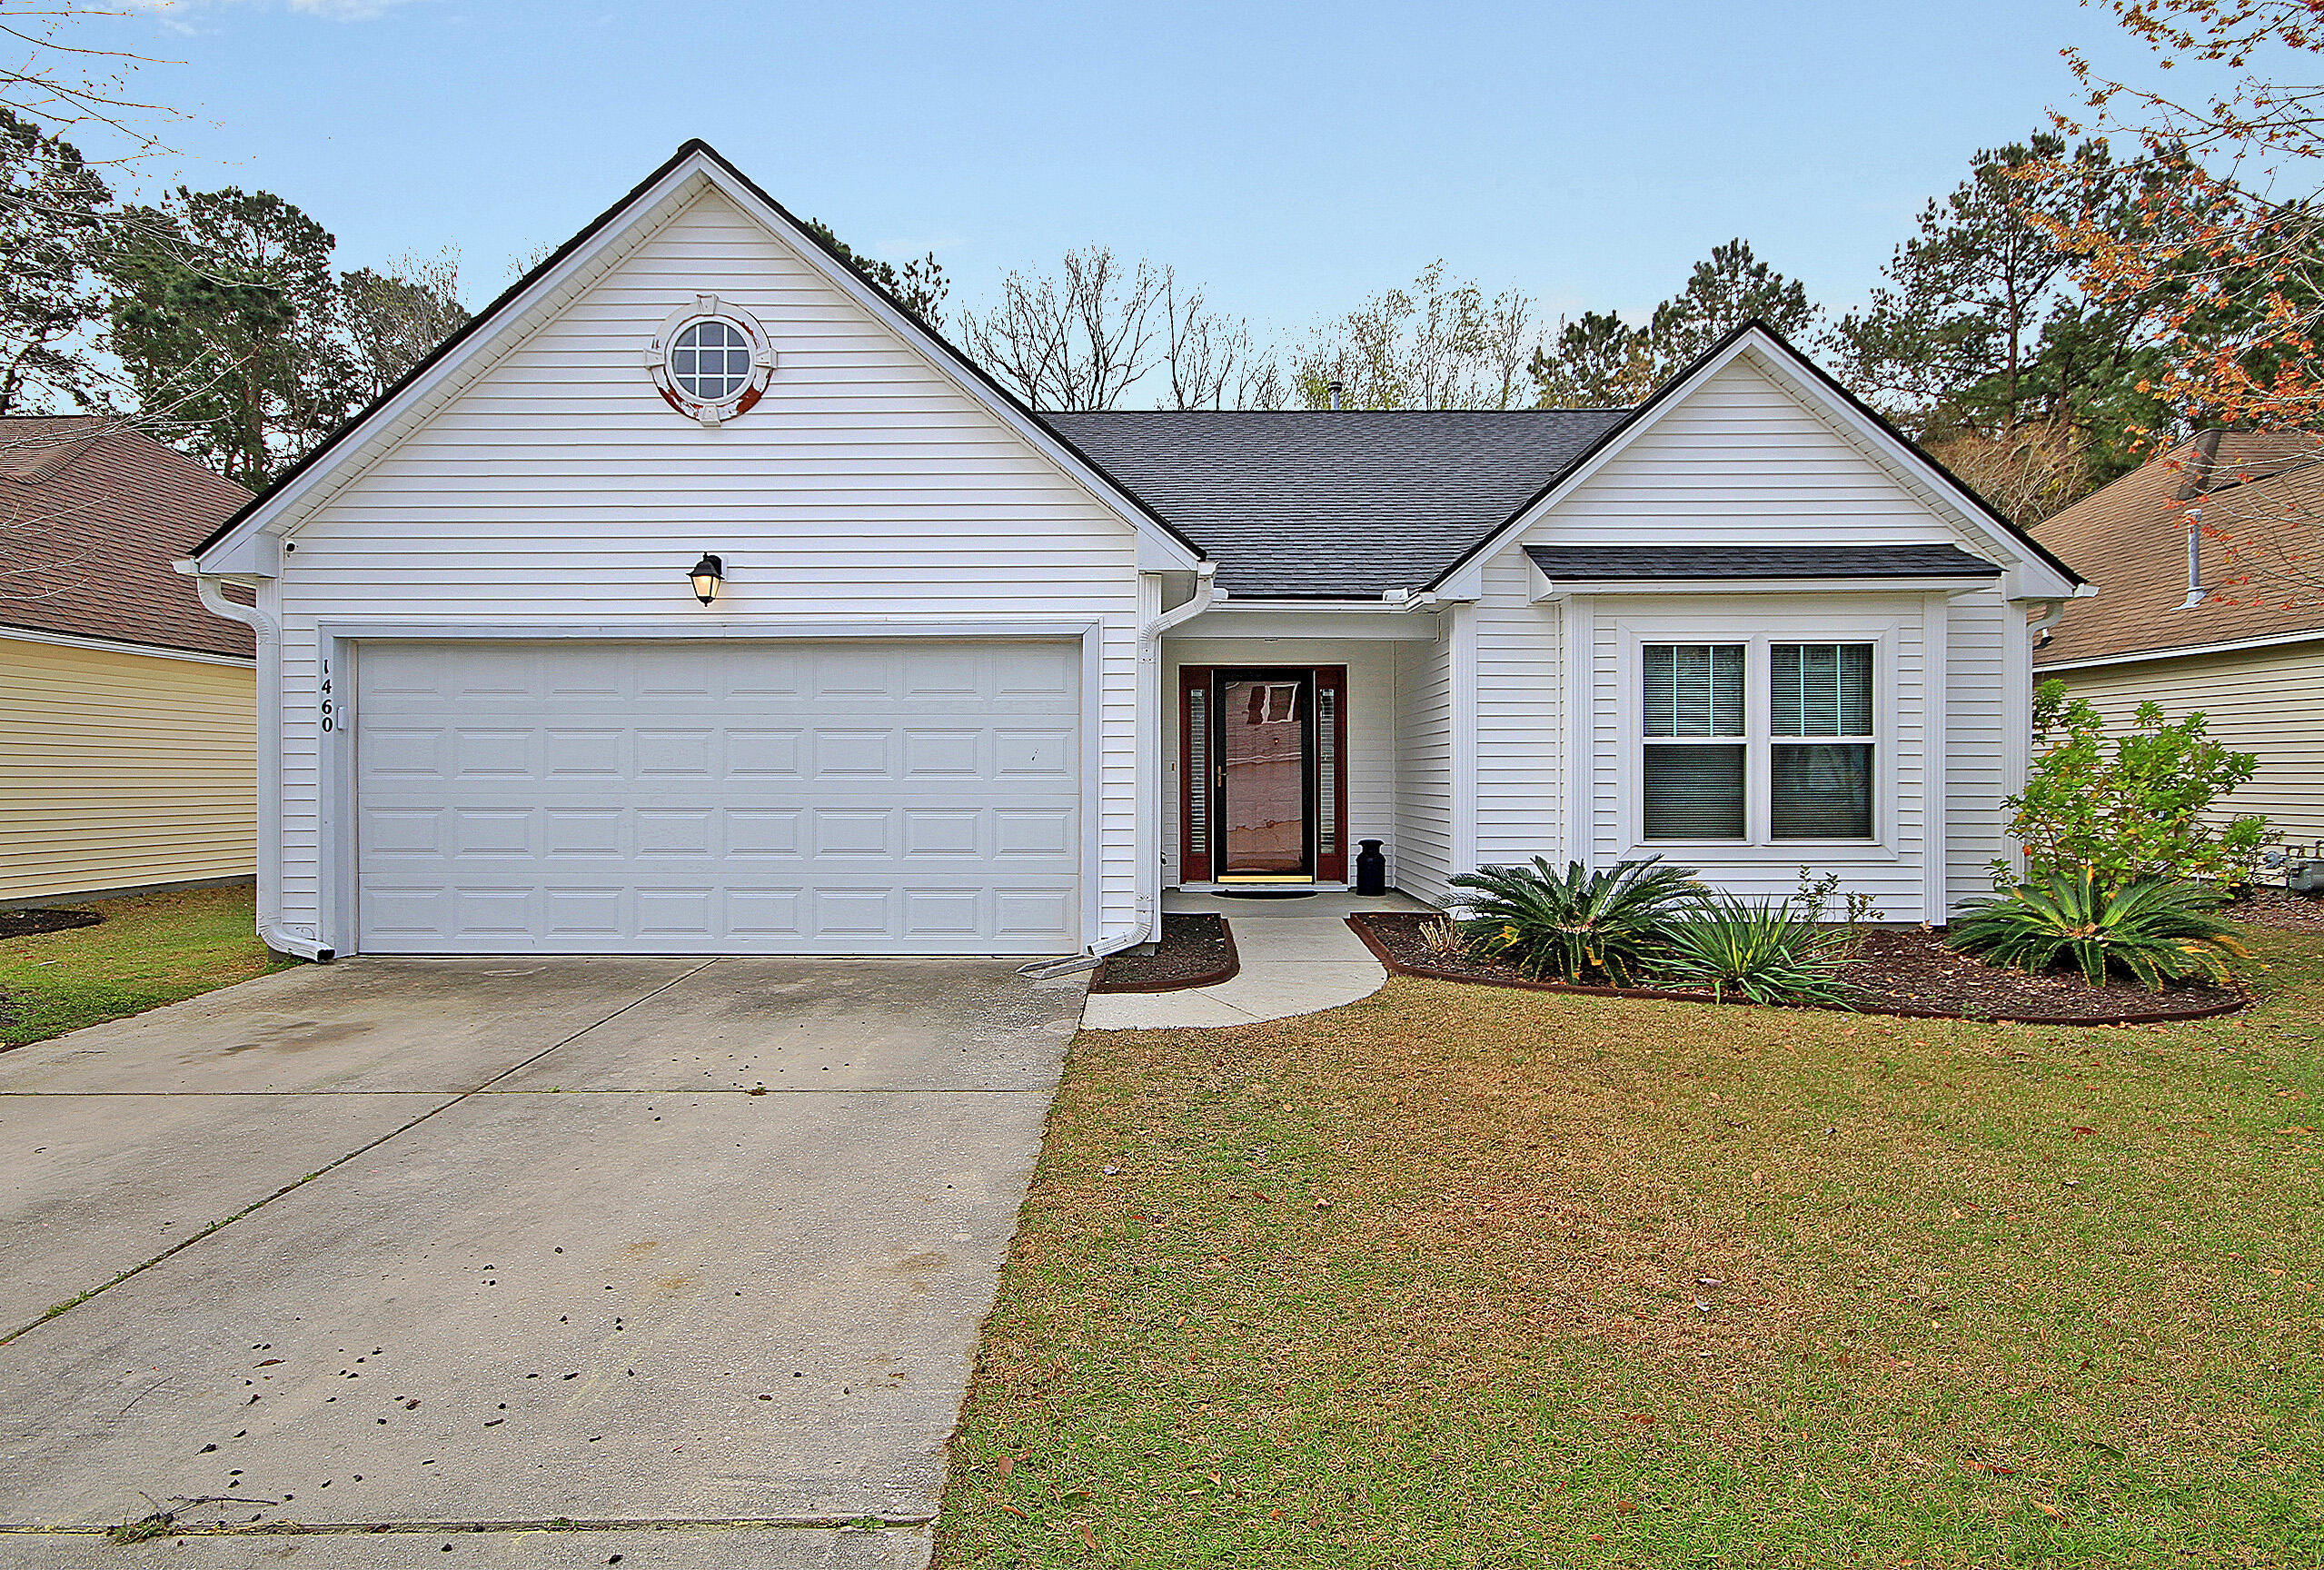 Park West Homes For Sale - 1460 Wellesley, Mount Pleasant, SC - 10